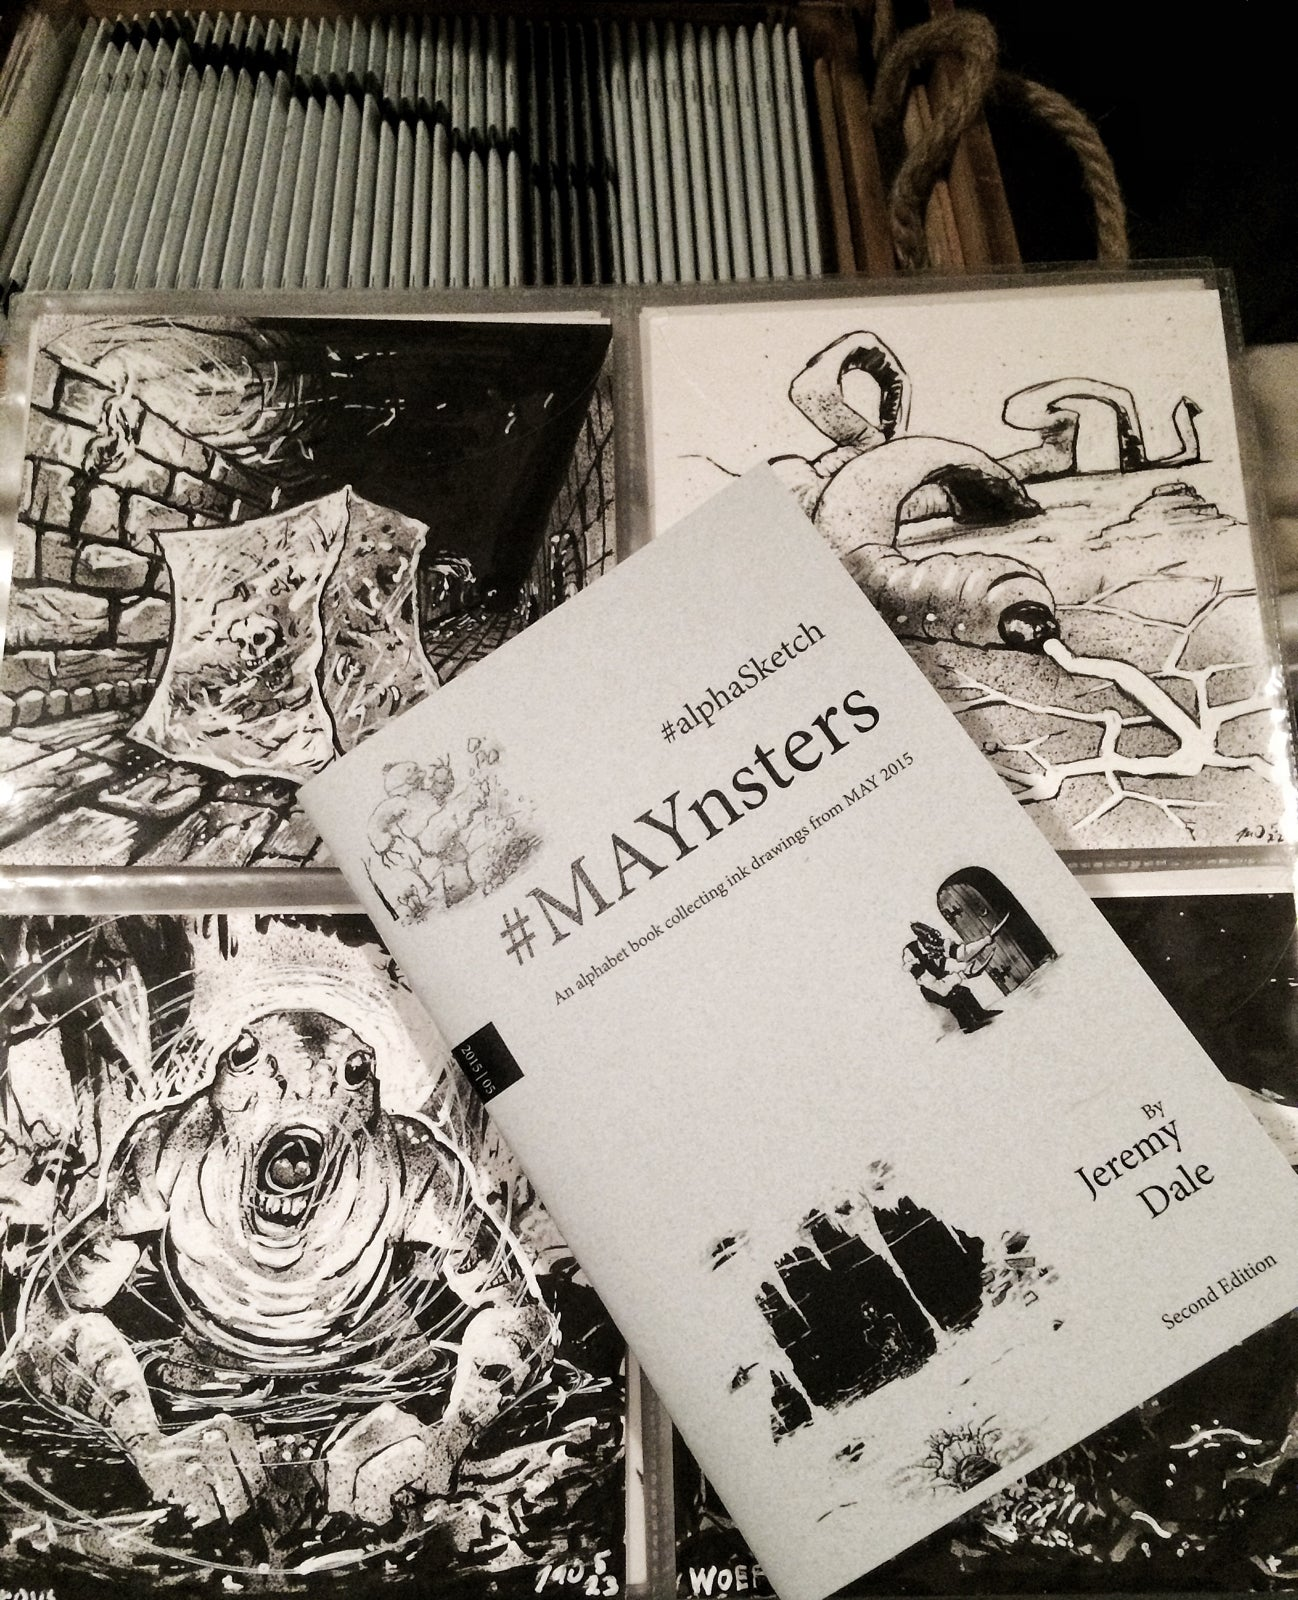 Maynsters #alphaSketch Books/Originals